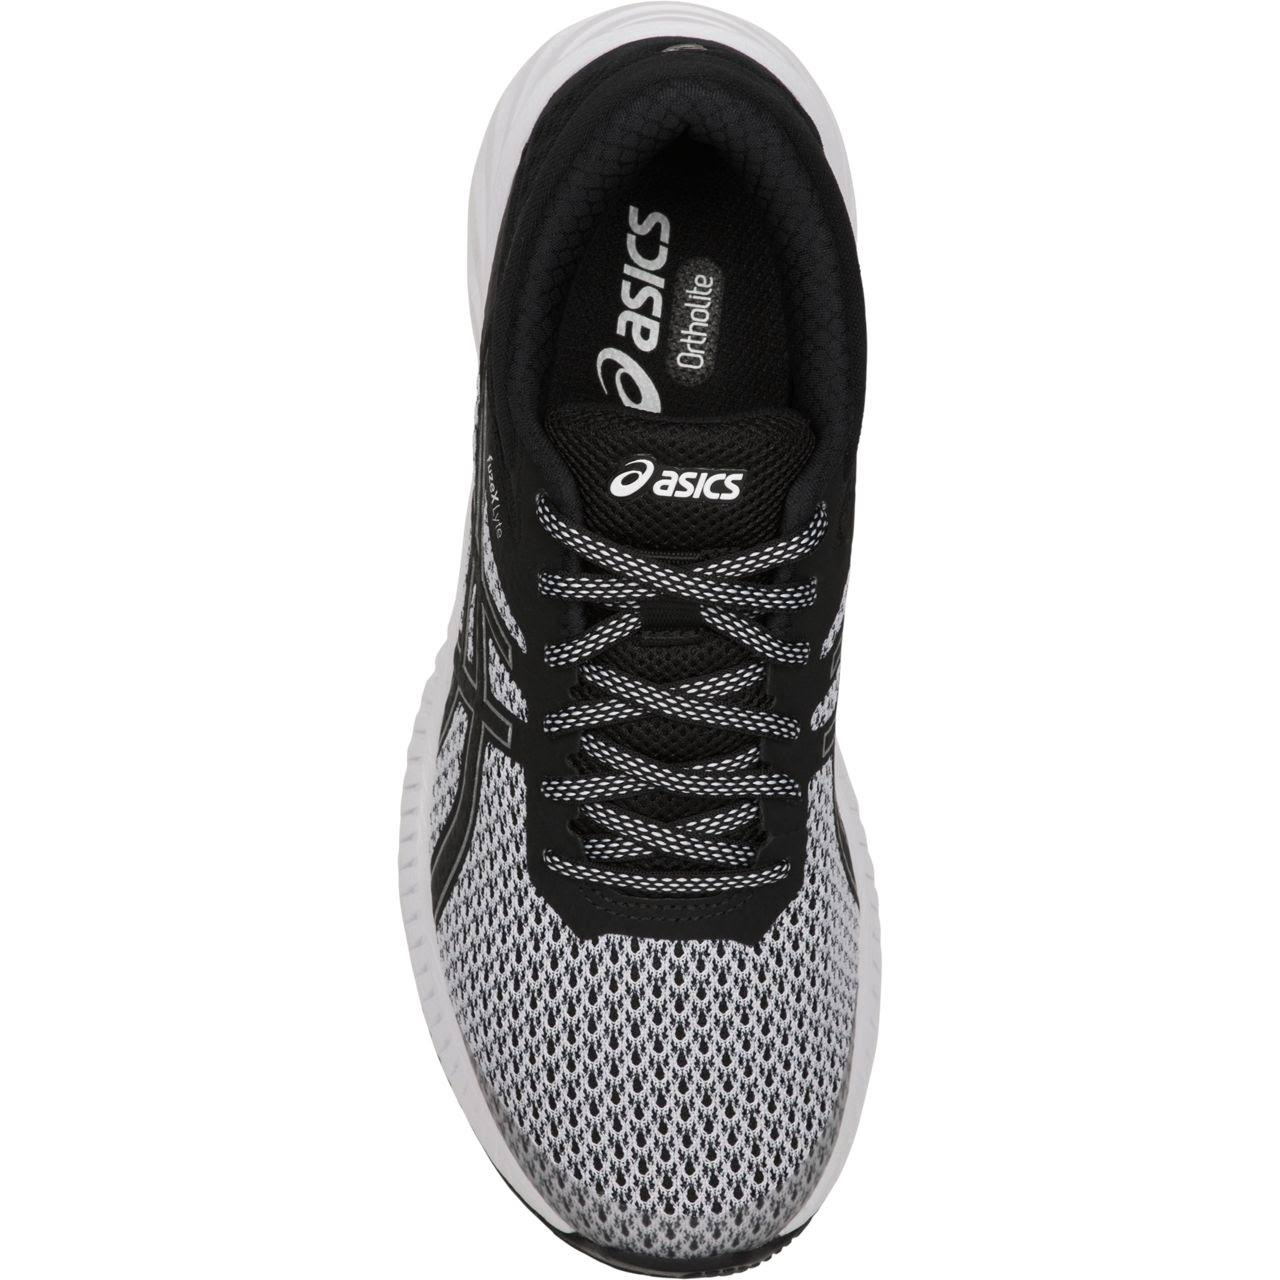 Shoe Fuzex Running Lightweight white Lyte Women's 2 Black Asics XFwq7xF